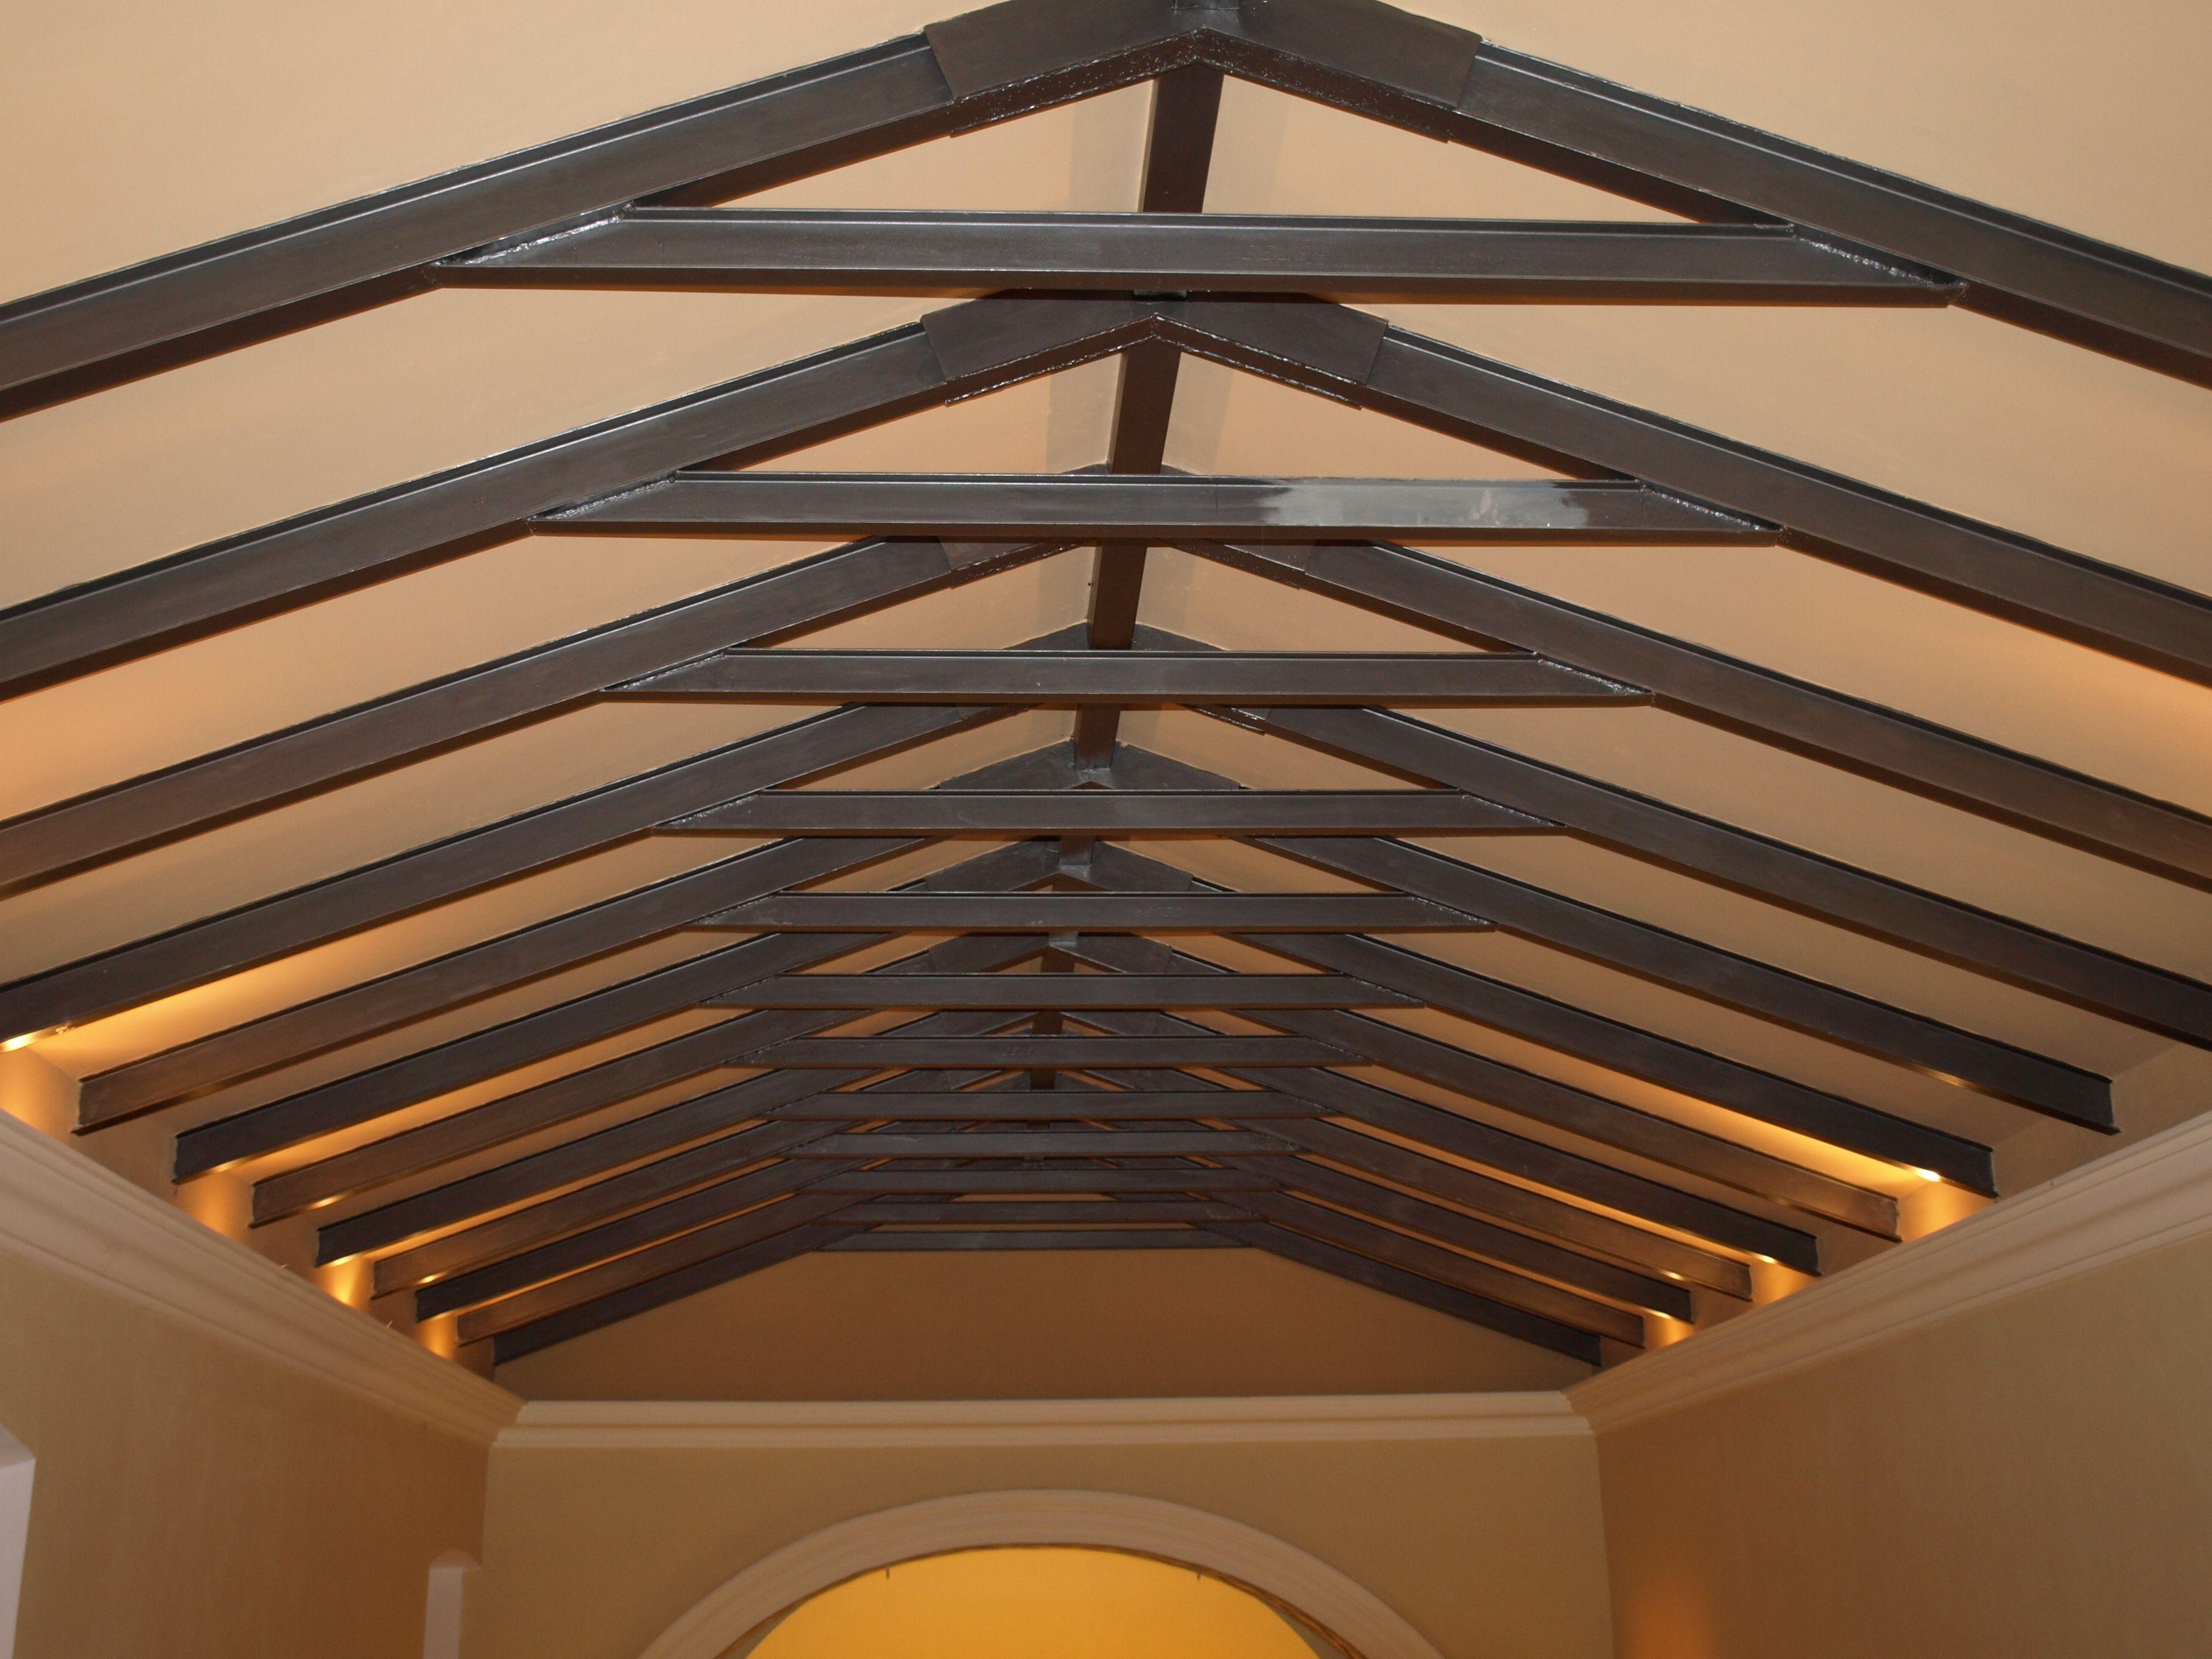 detalle del techo de la ermita